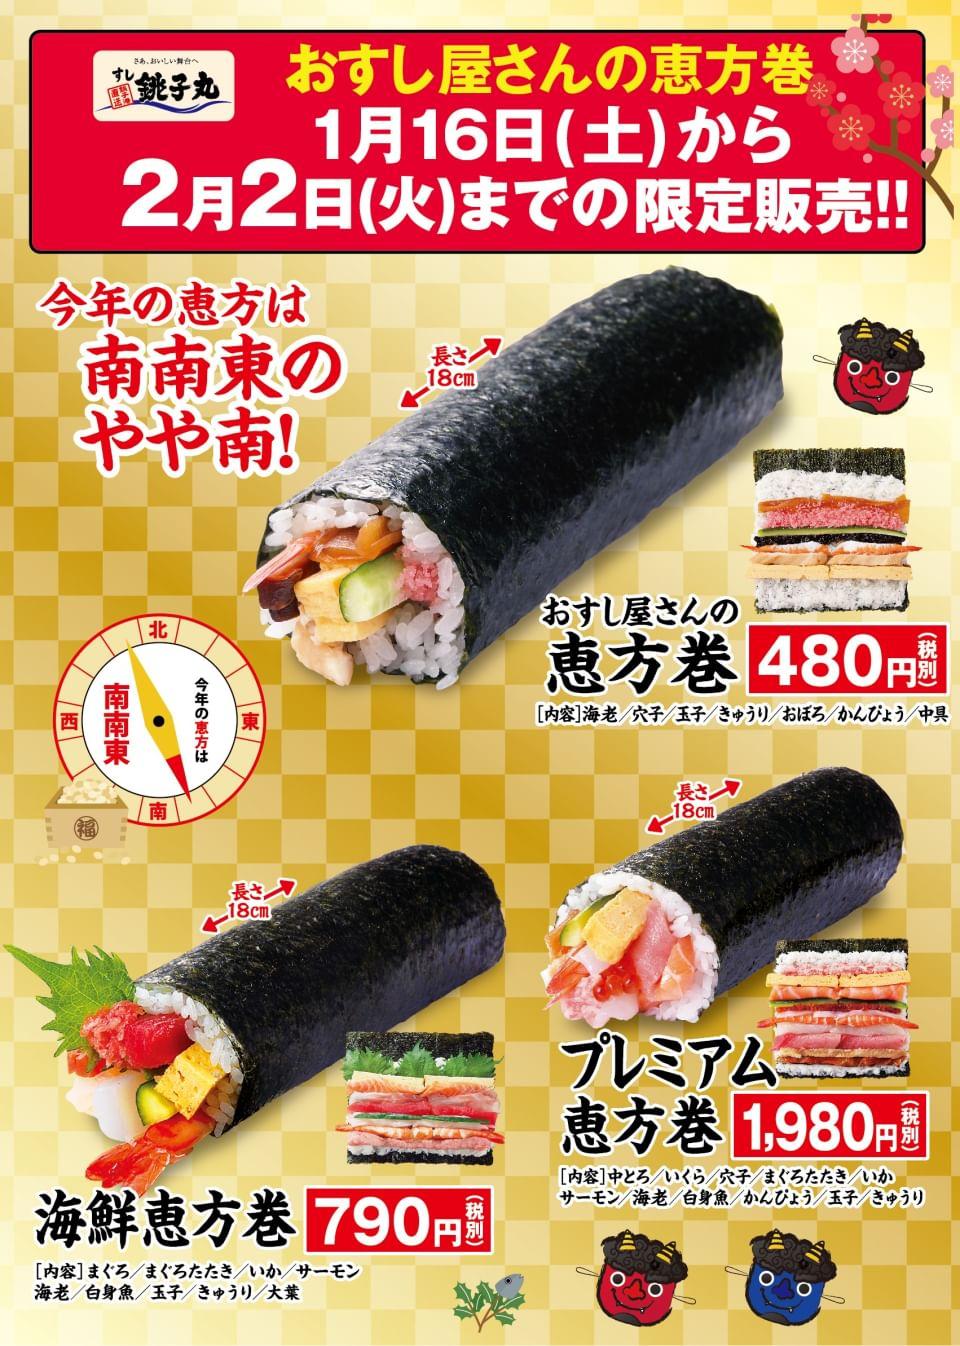 丸 巻き 銚子 恵方